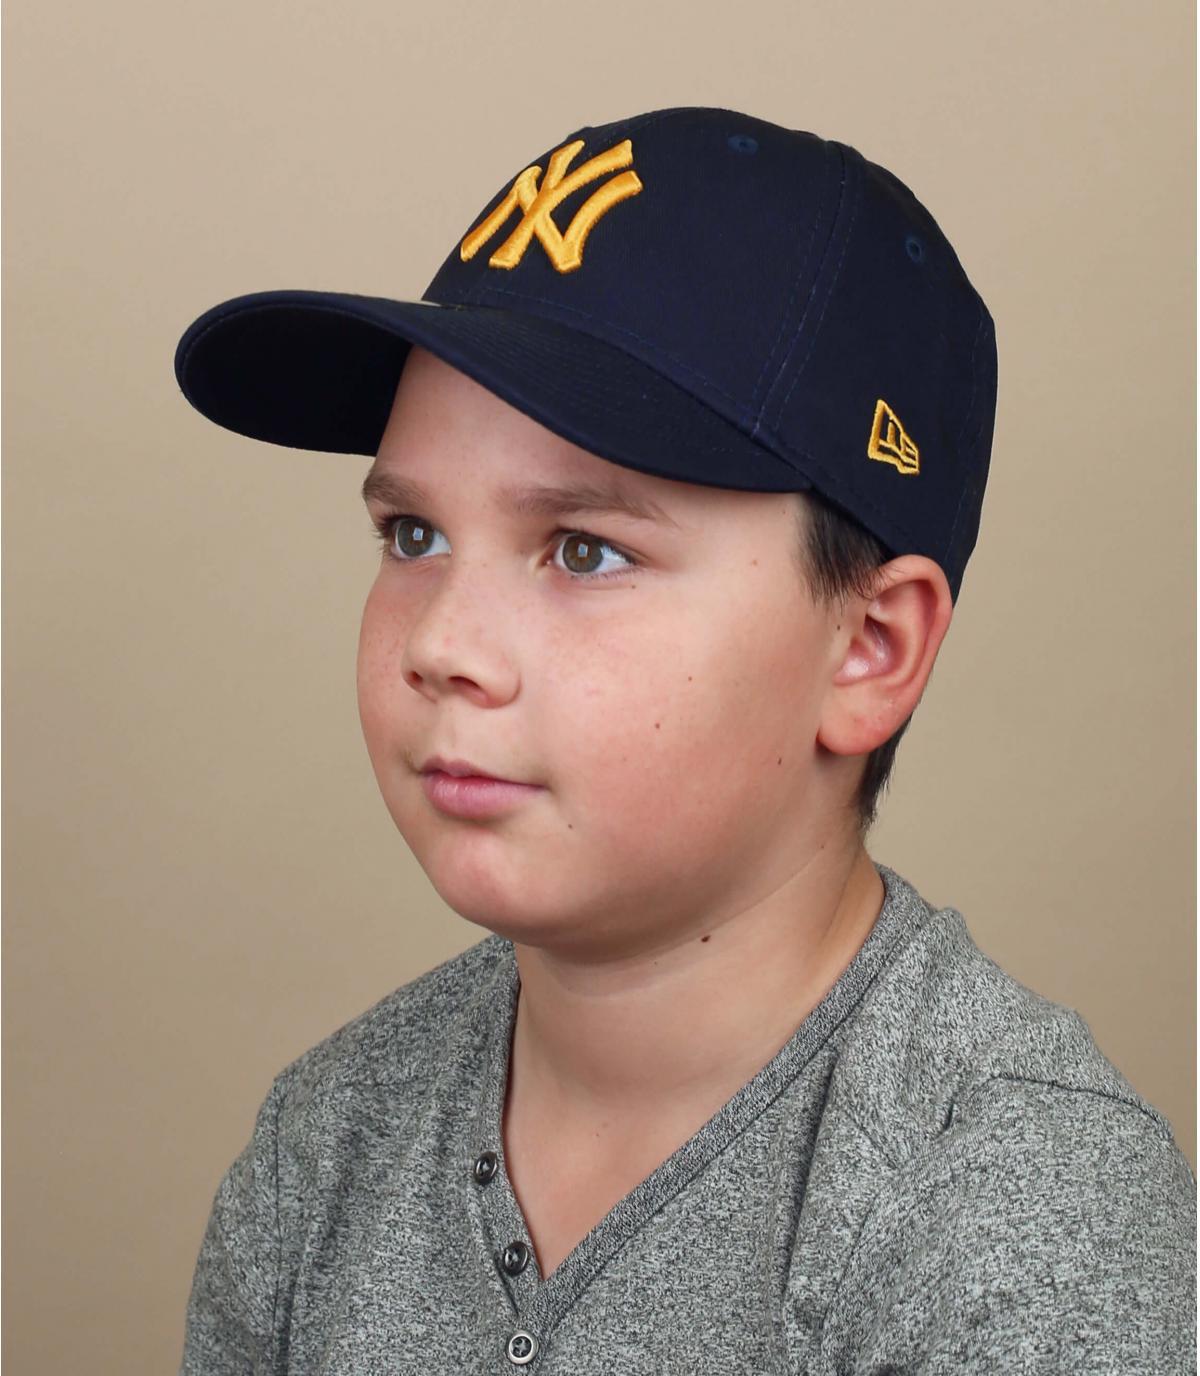 casquette enfant NY bleu marine